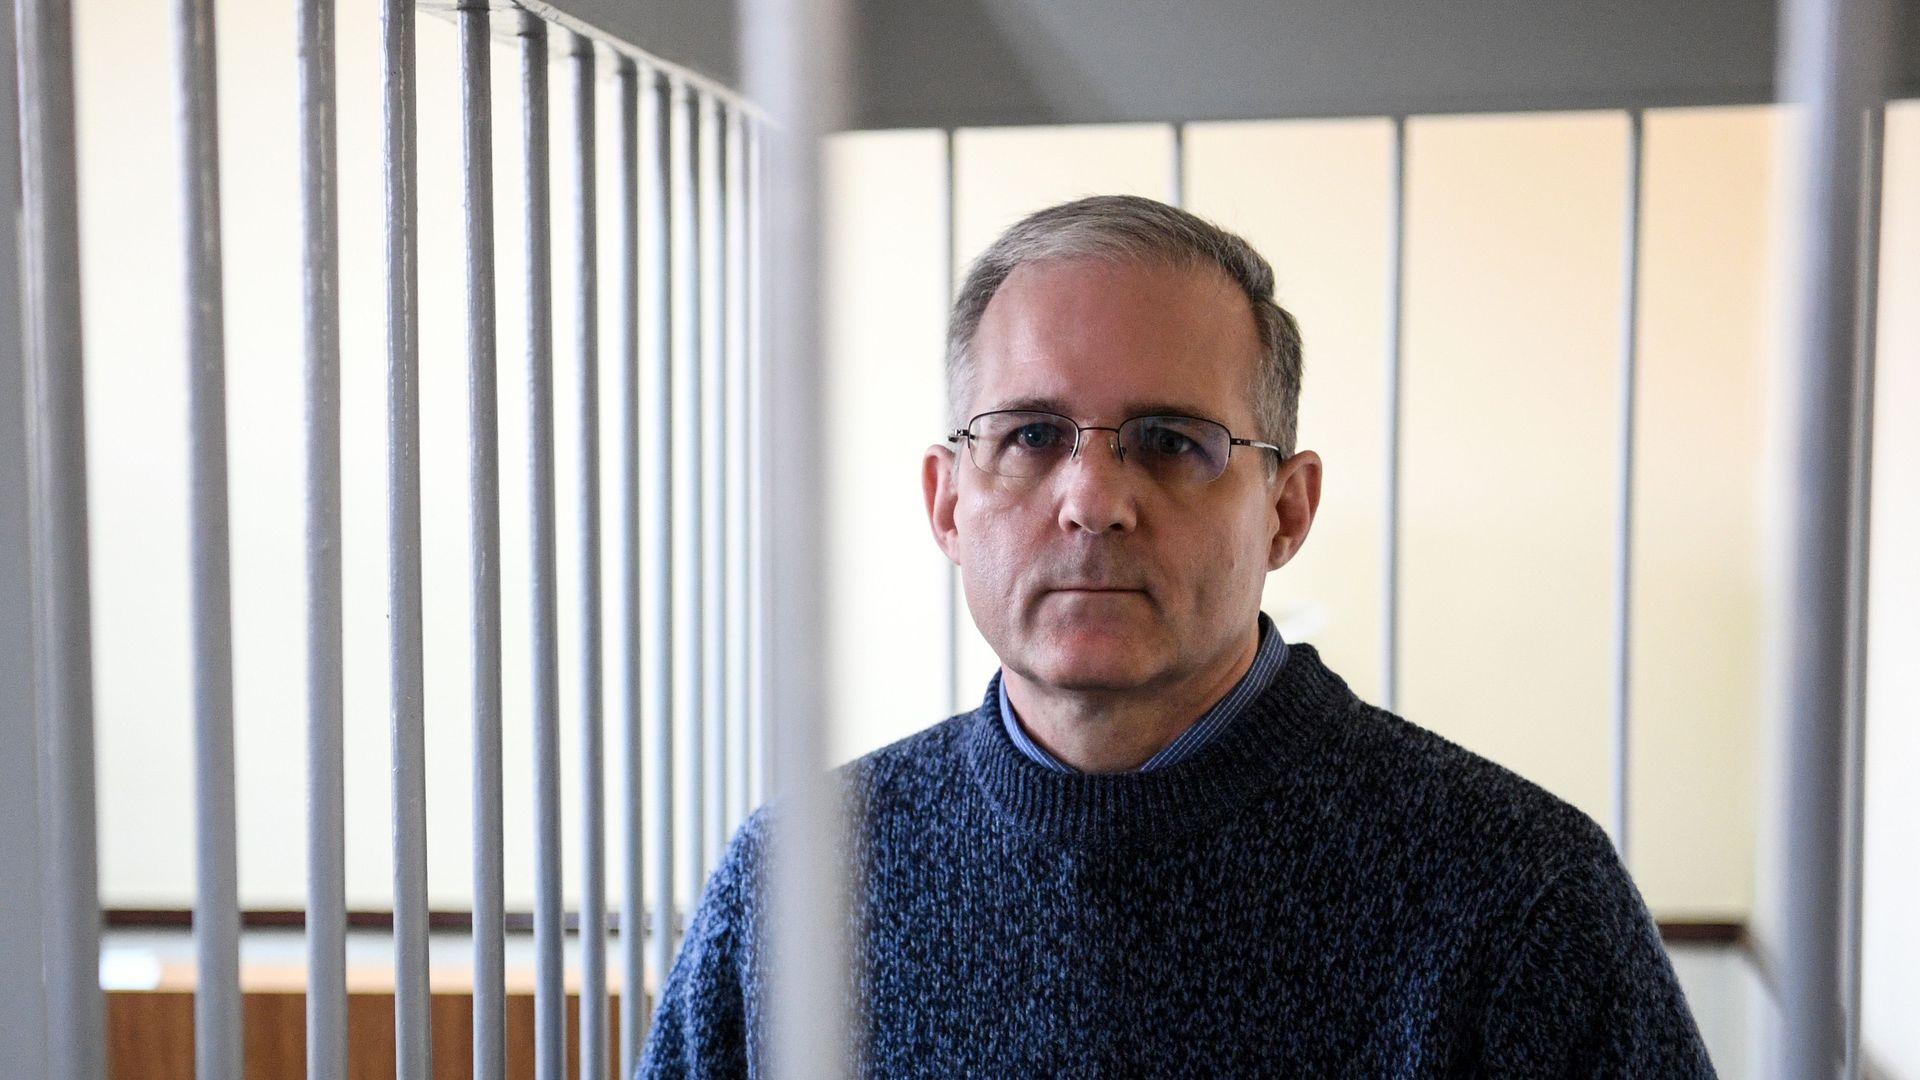 Trump confidant David Urban lobbying to free U.S. citizen Paul Whelan from Russia